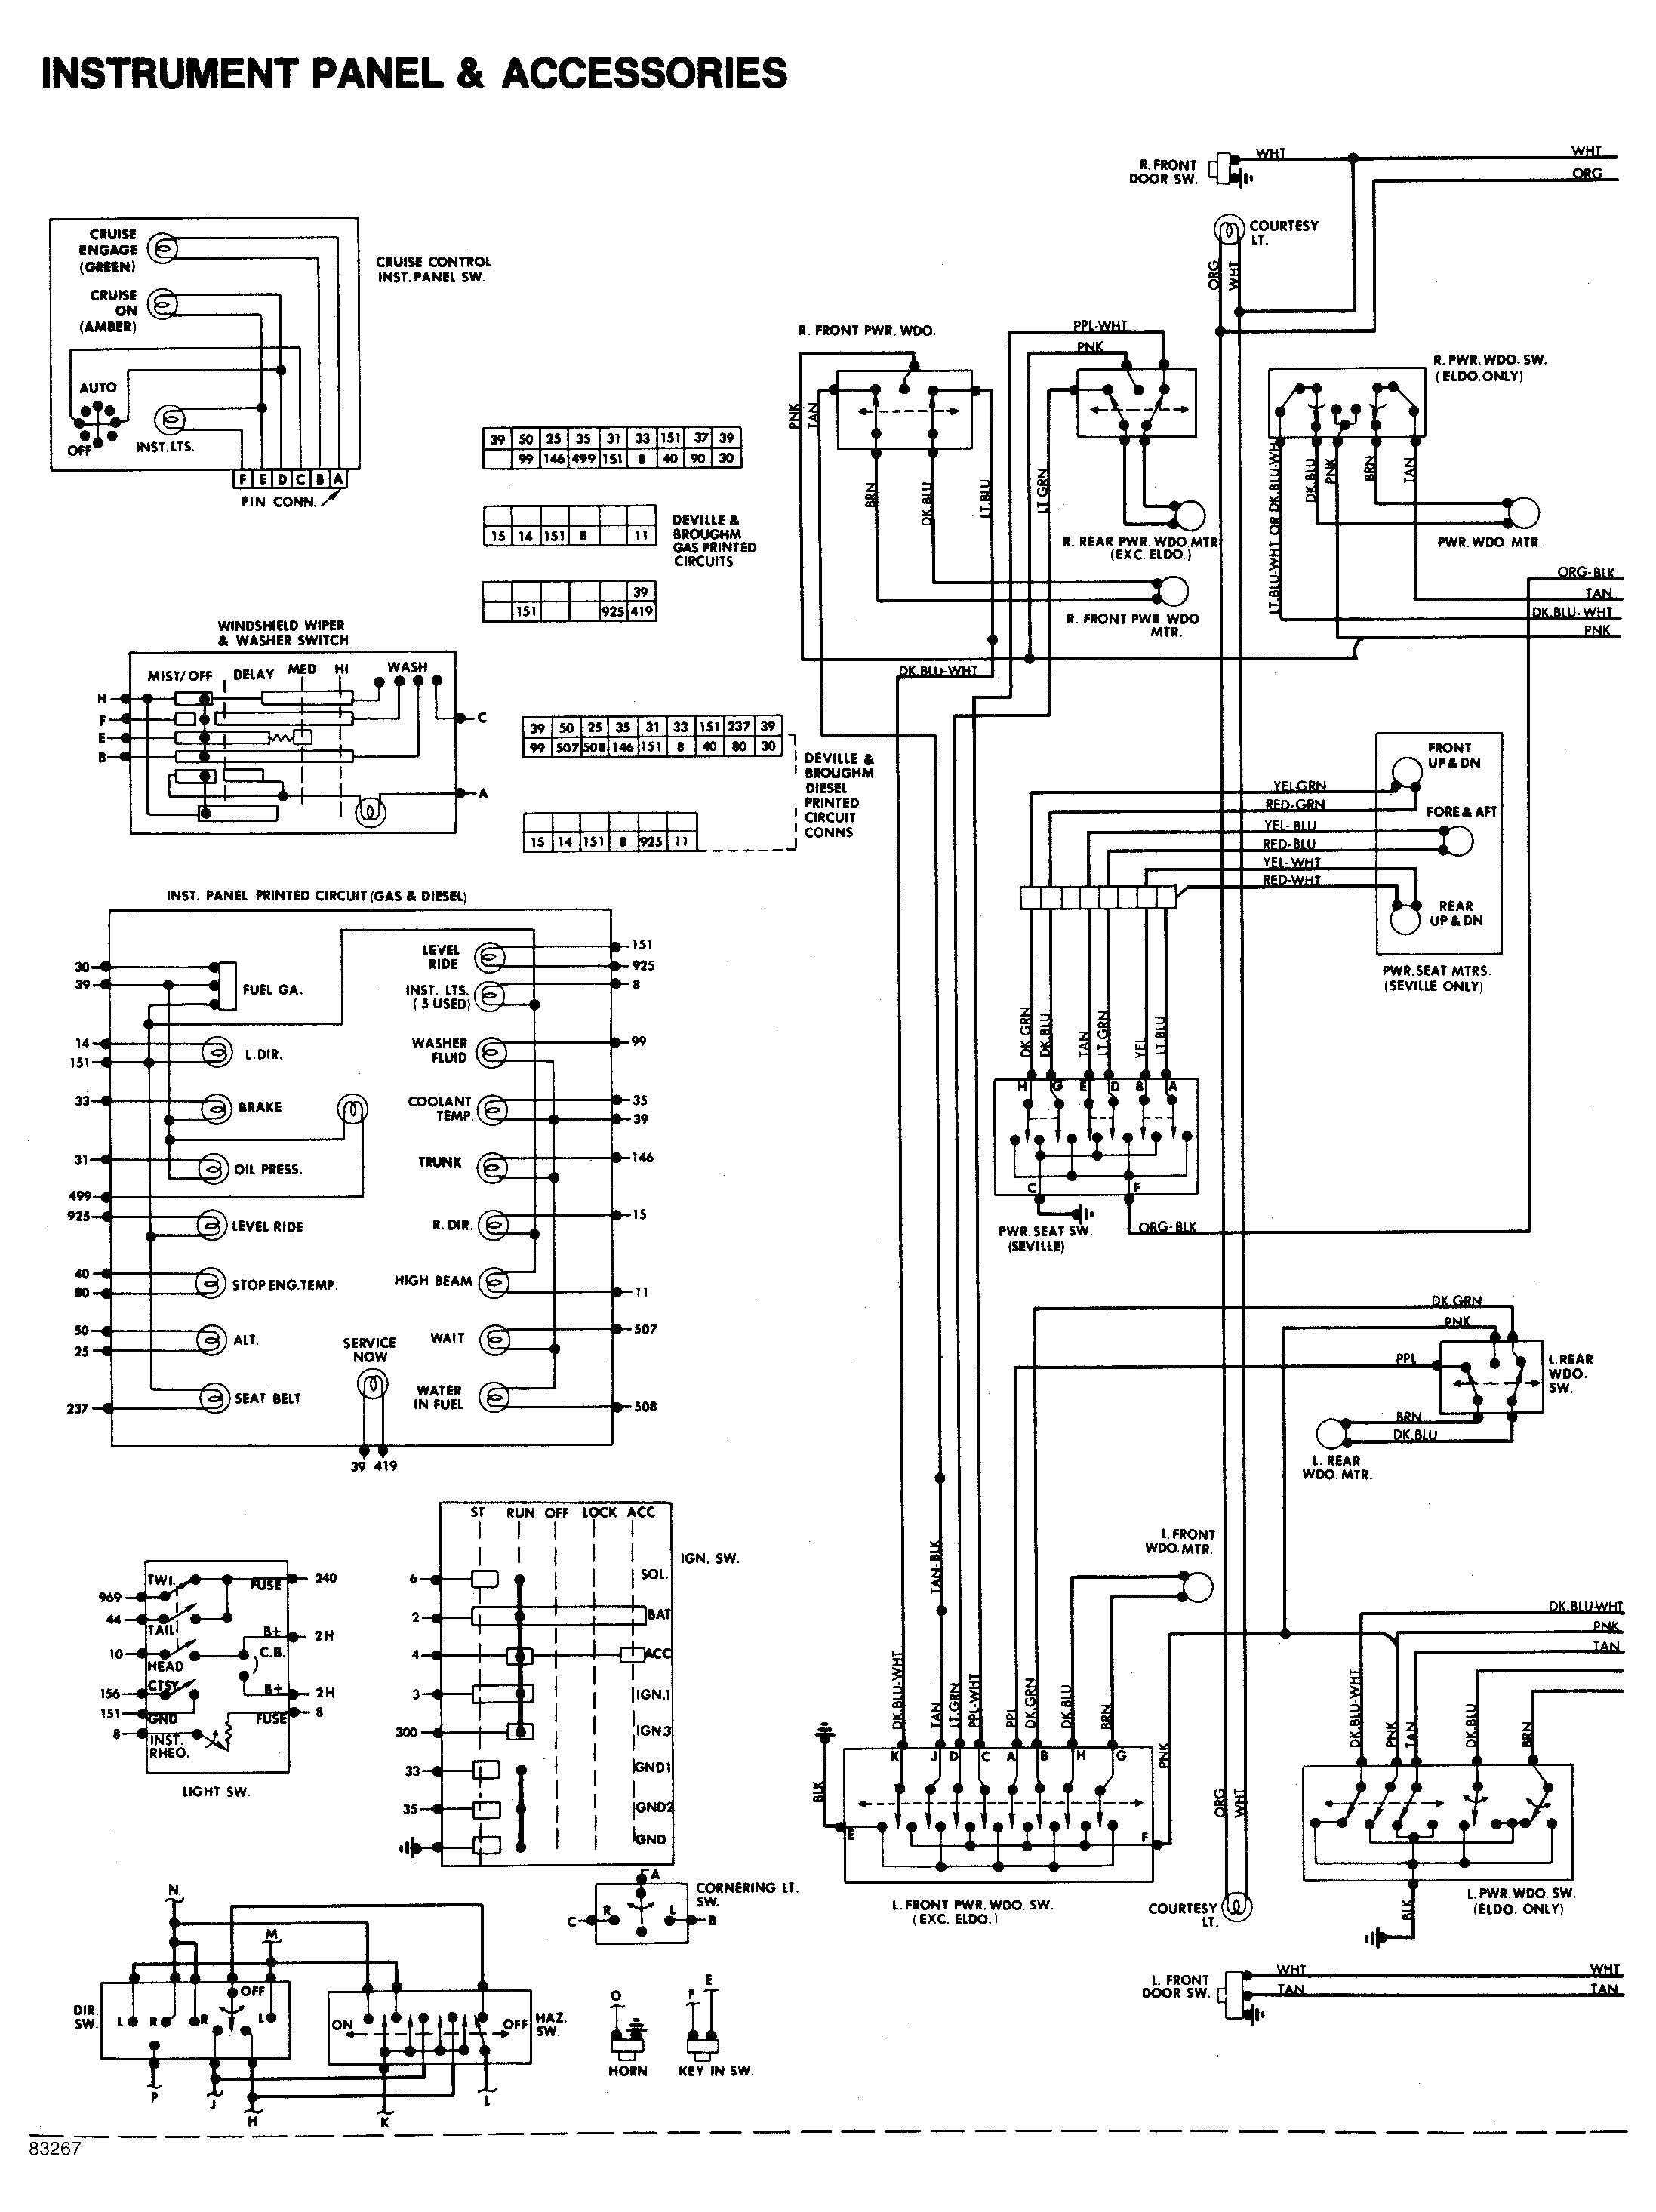 2006 cadillac cts radio wiring diagram inspirational denali bose location moreover 2003 factory of within vw diagrams jpg